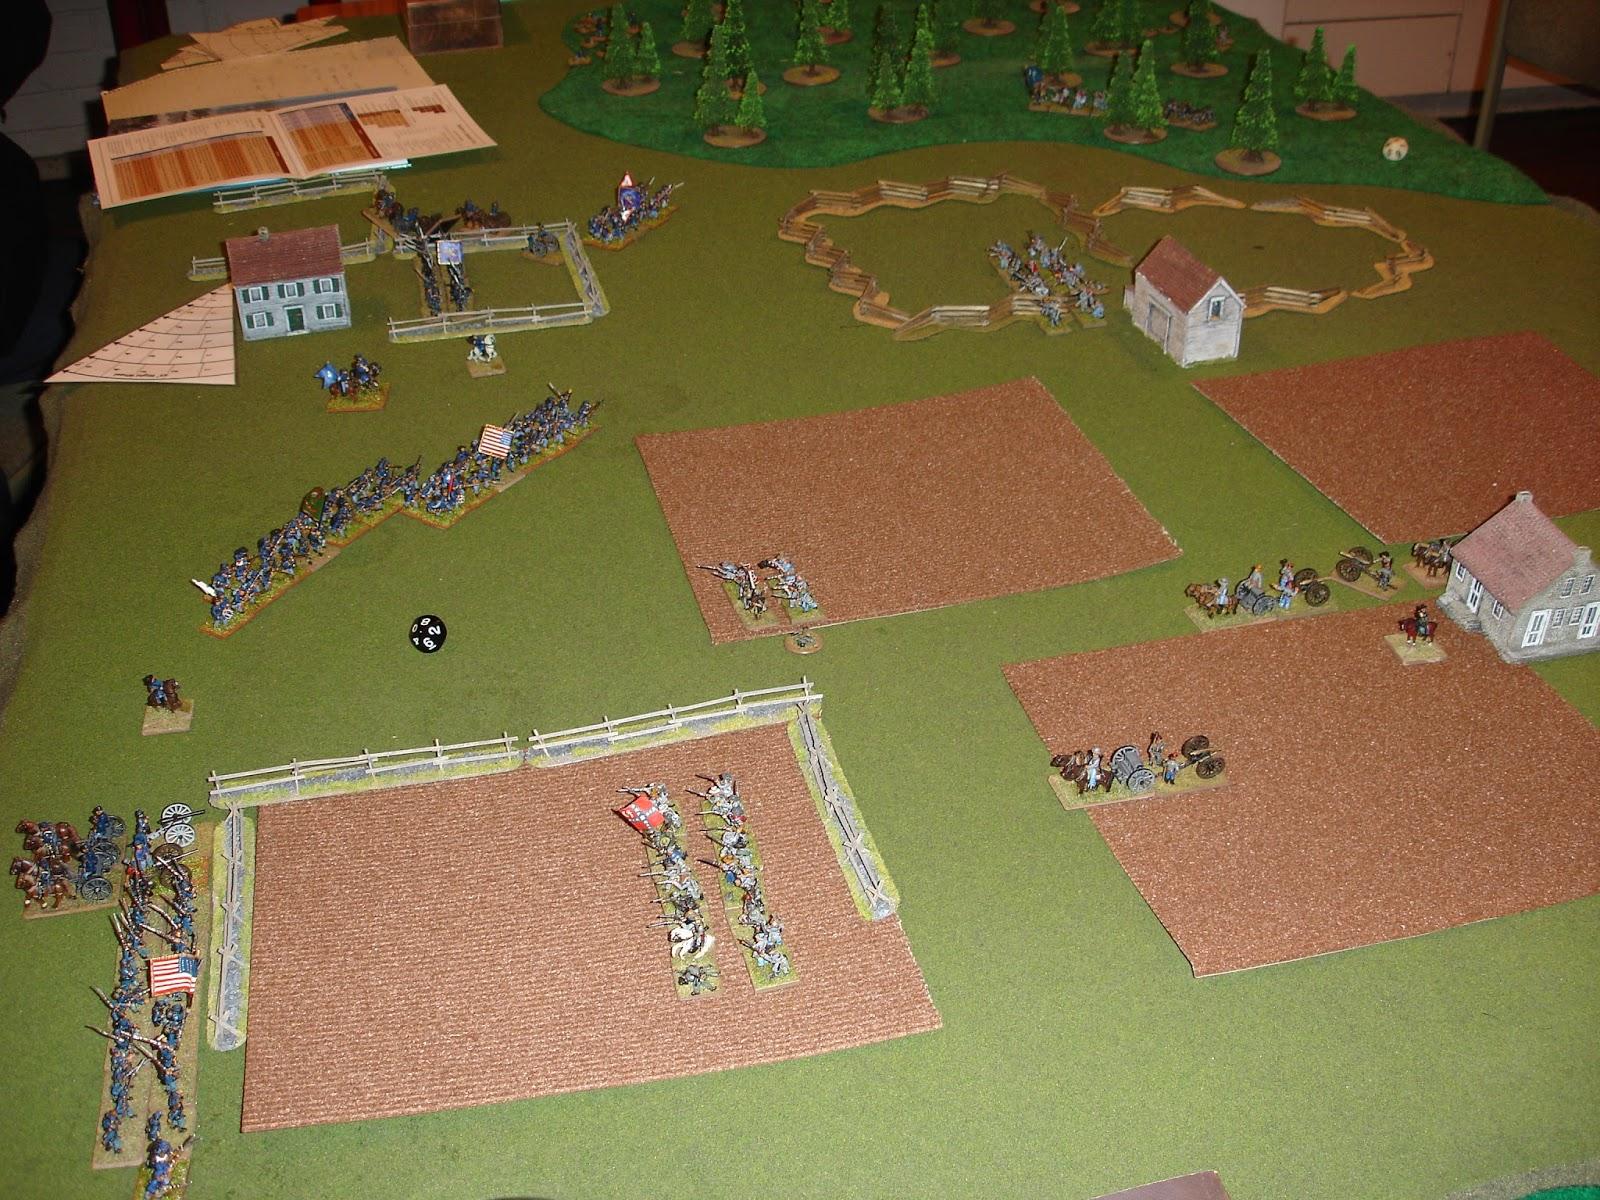 Napoleonic Wargaming Society: Black Powder, Impetus and Fire